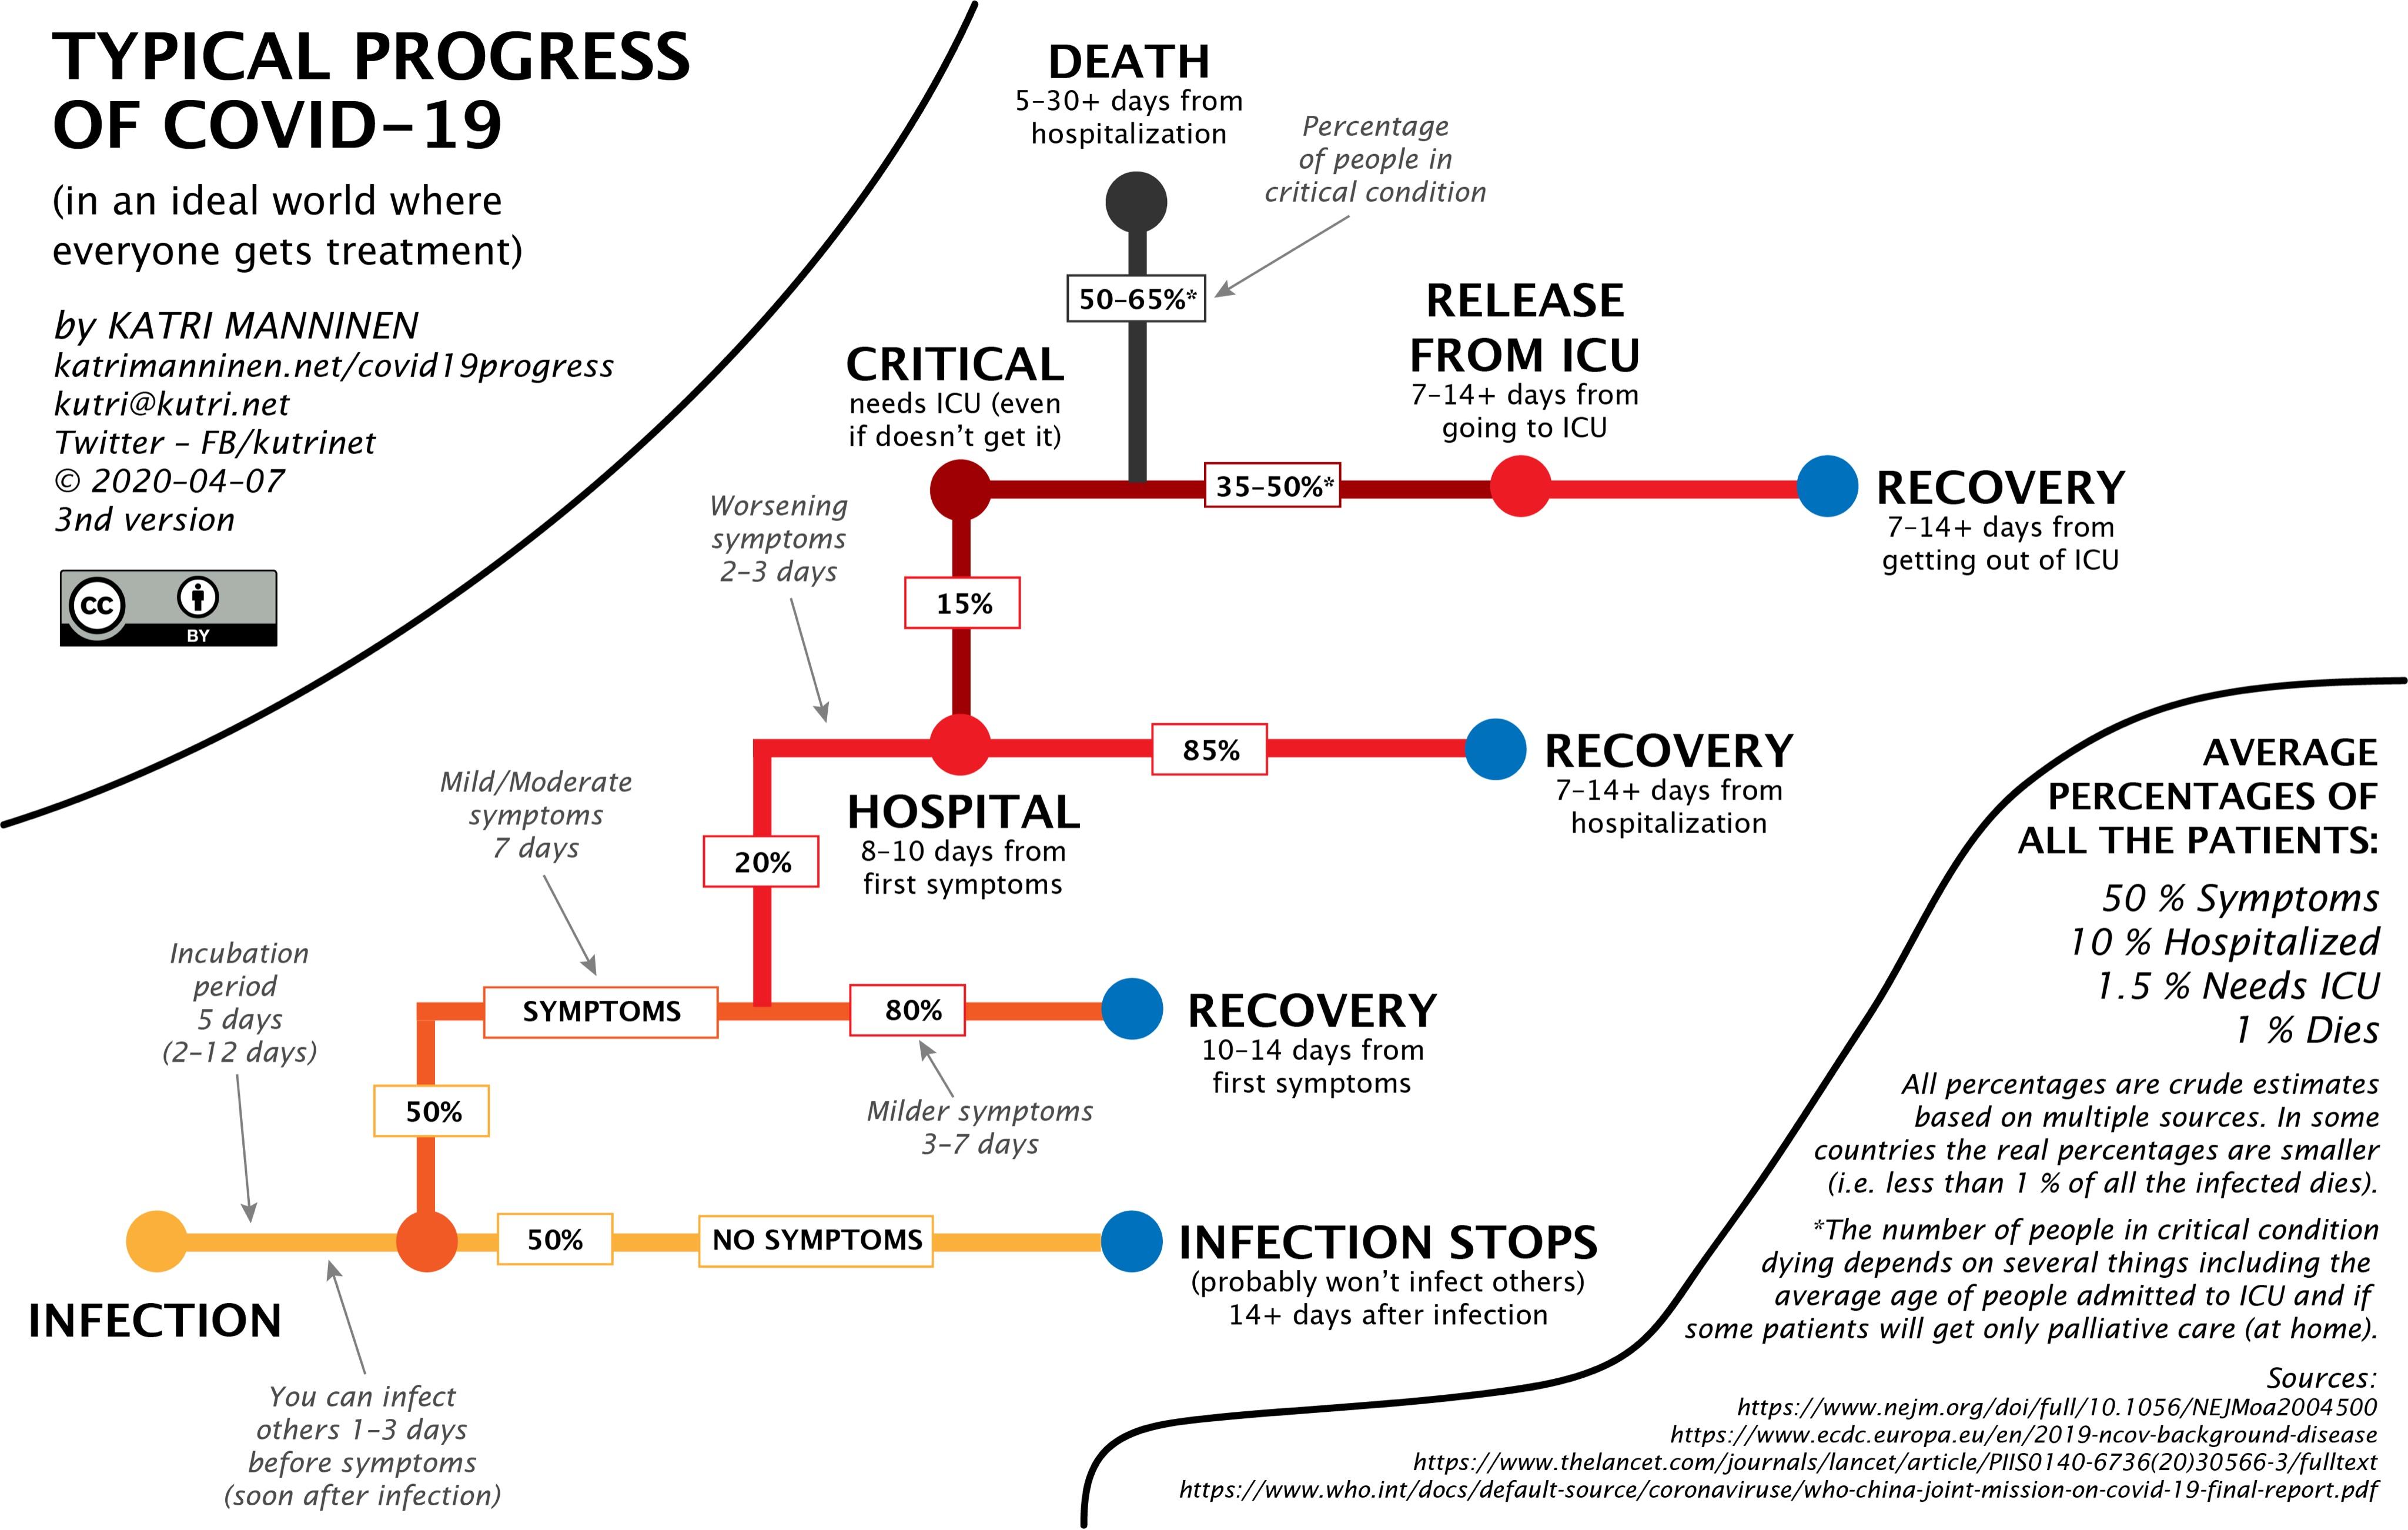 Typical Progress of COVID-19  Katri Manninen @kutrinet  #Progression #Timeline #COVID19 #SARSCOV2 #Coronavirus #Tree